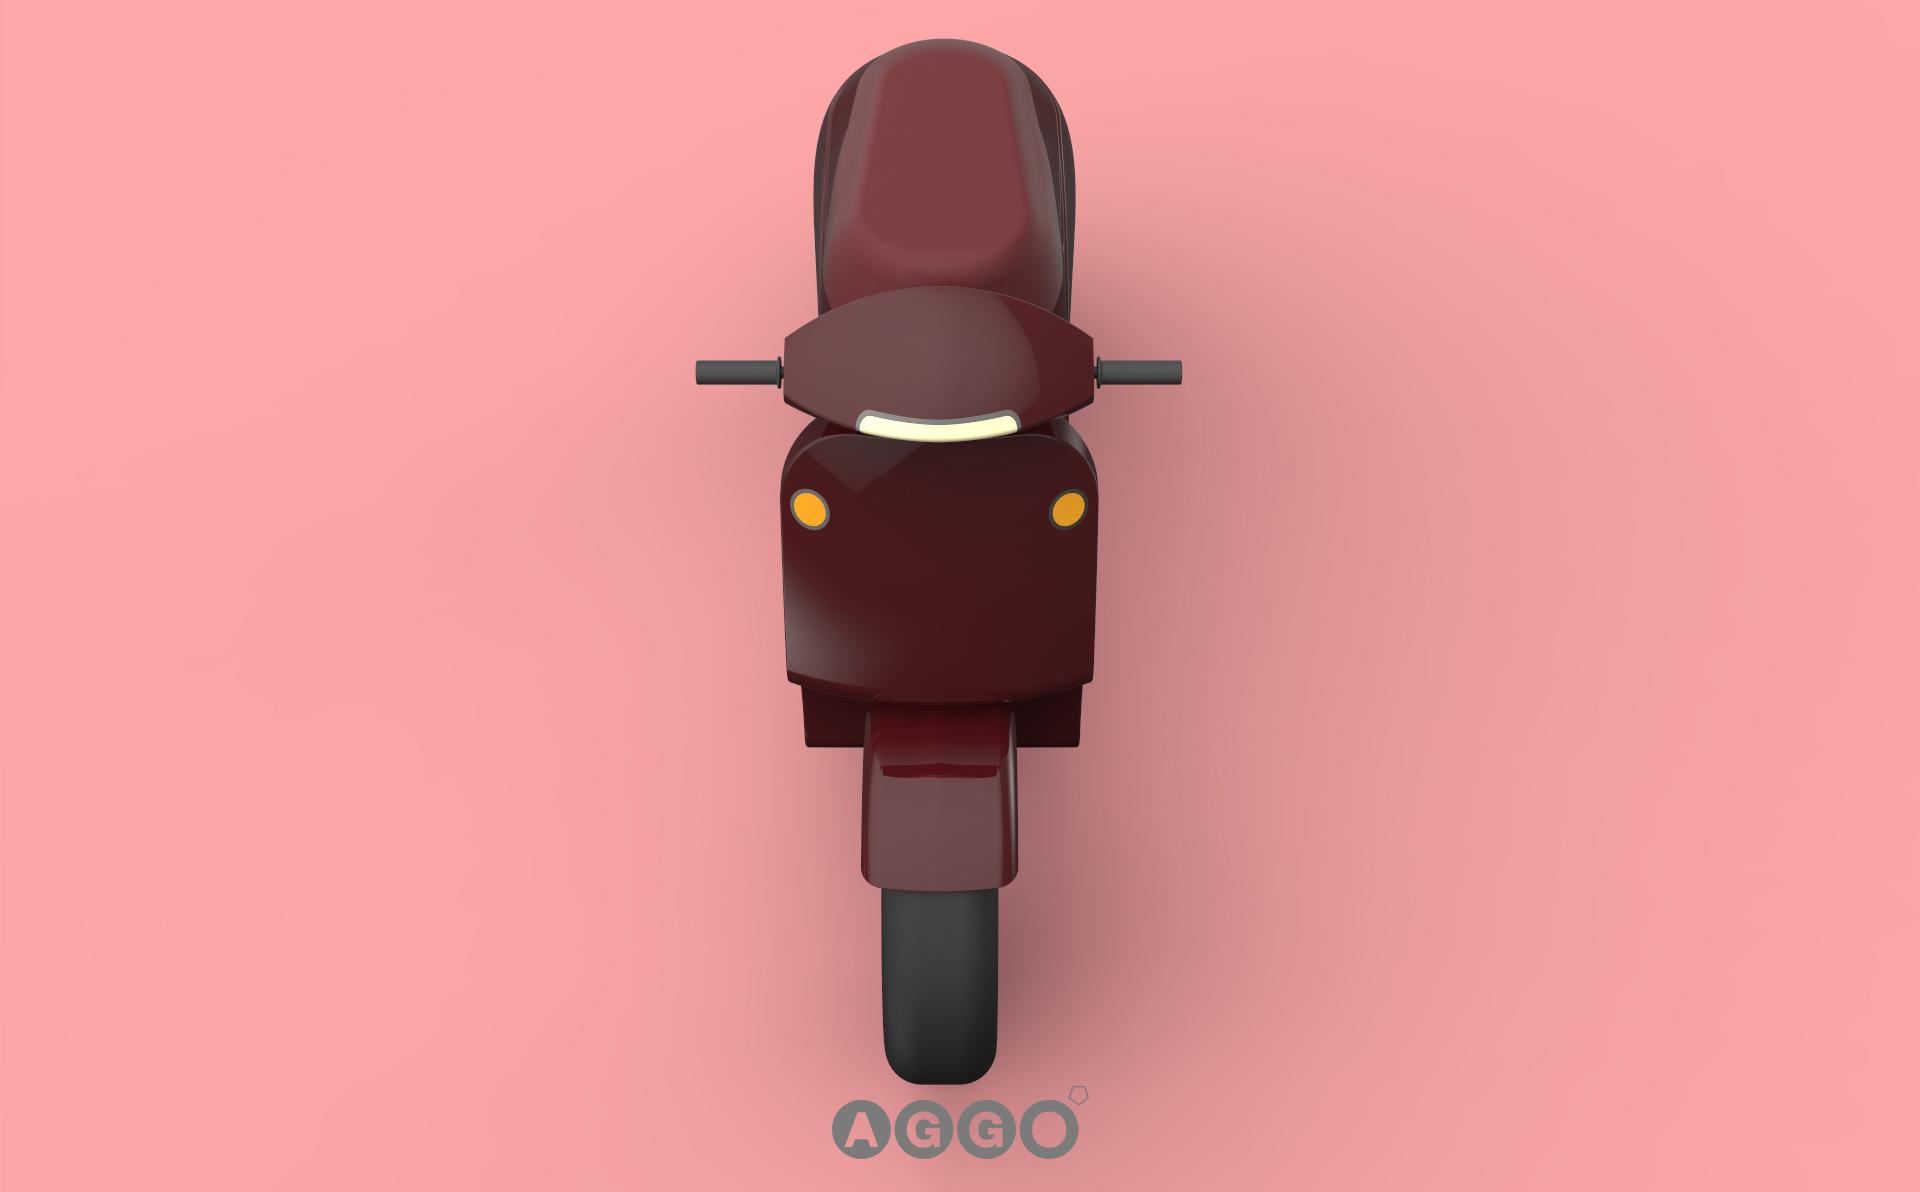 Electric_Bike_by_Aggo_010.jpg